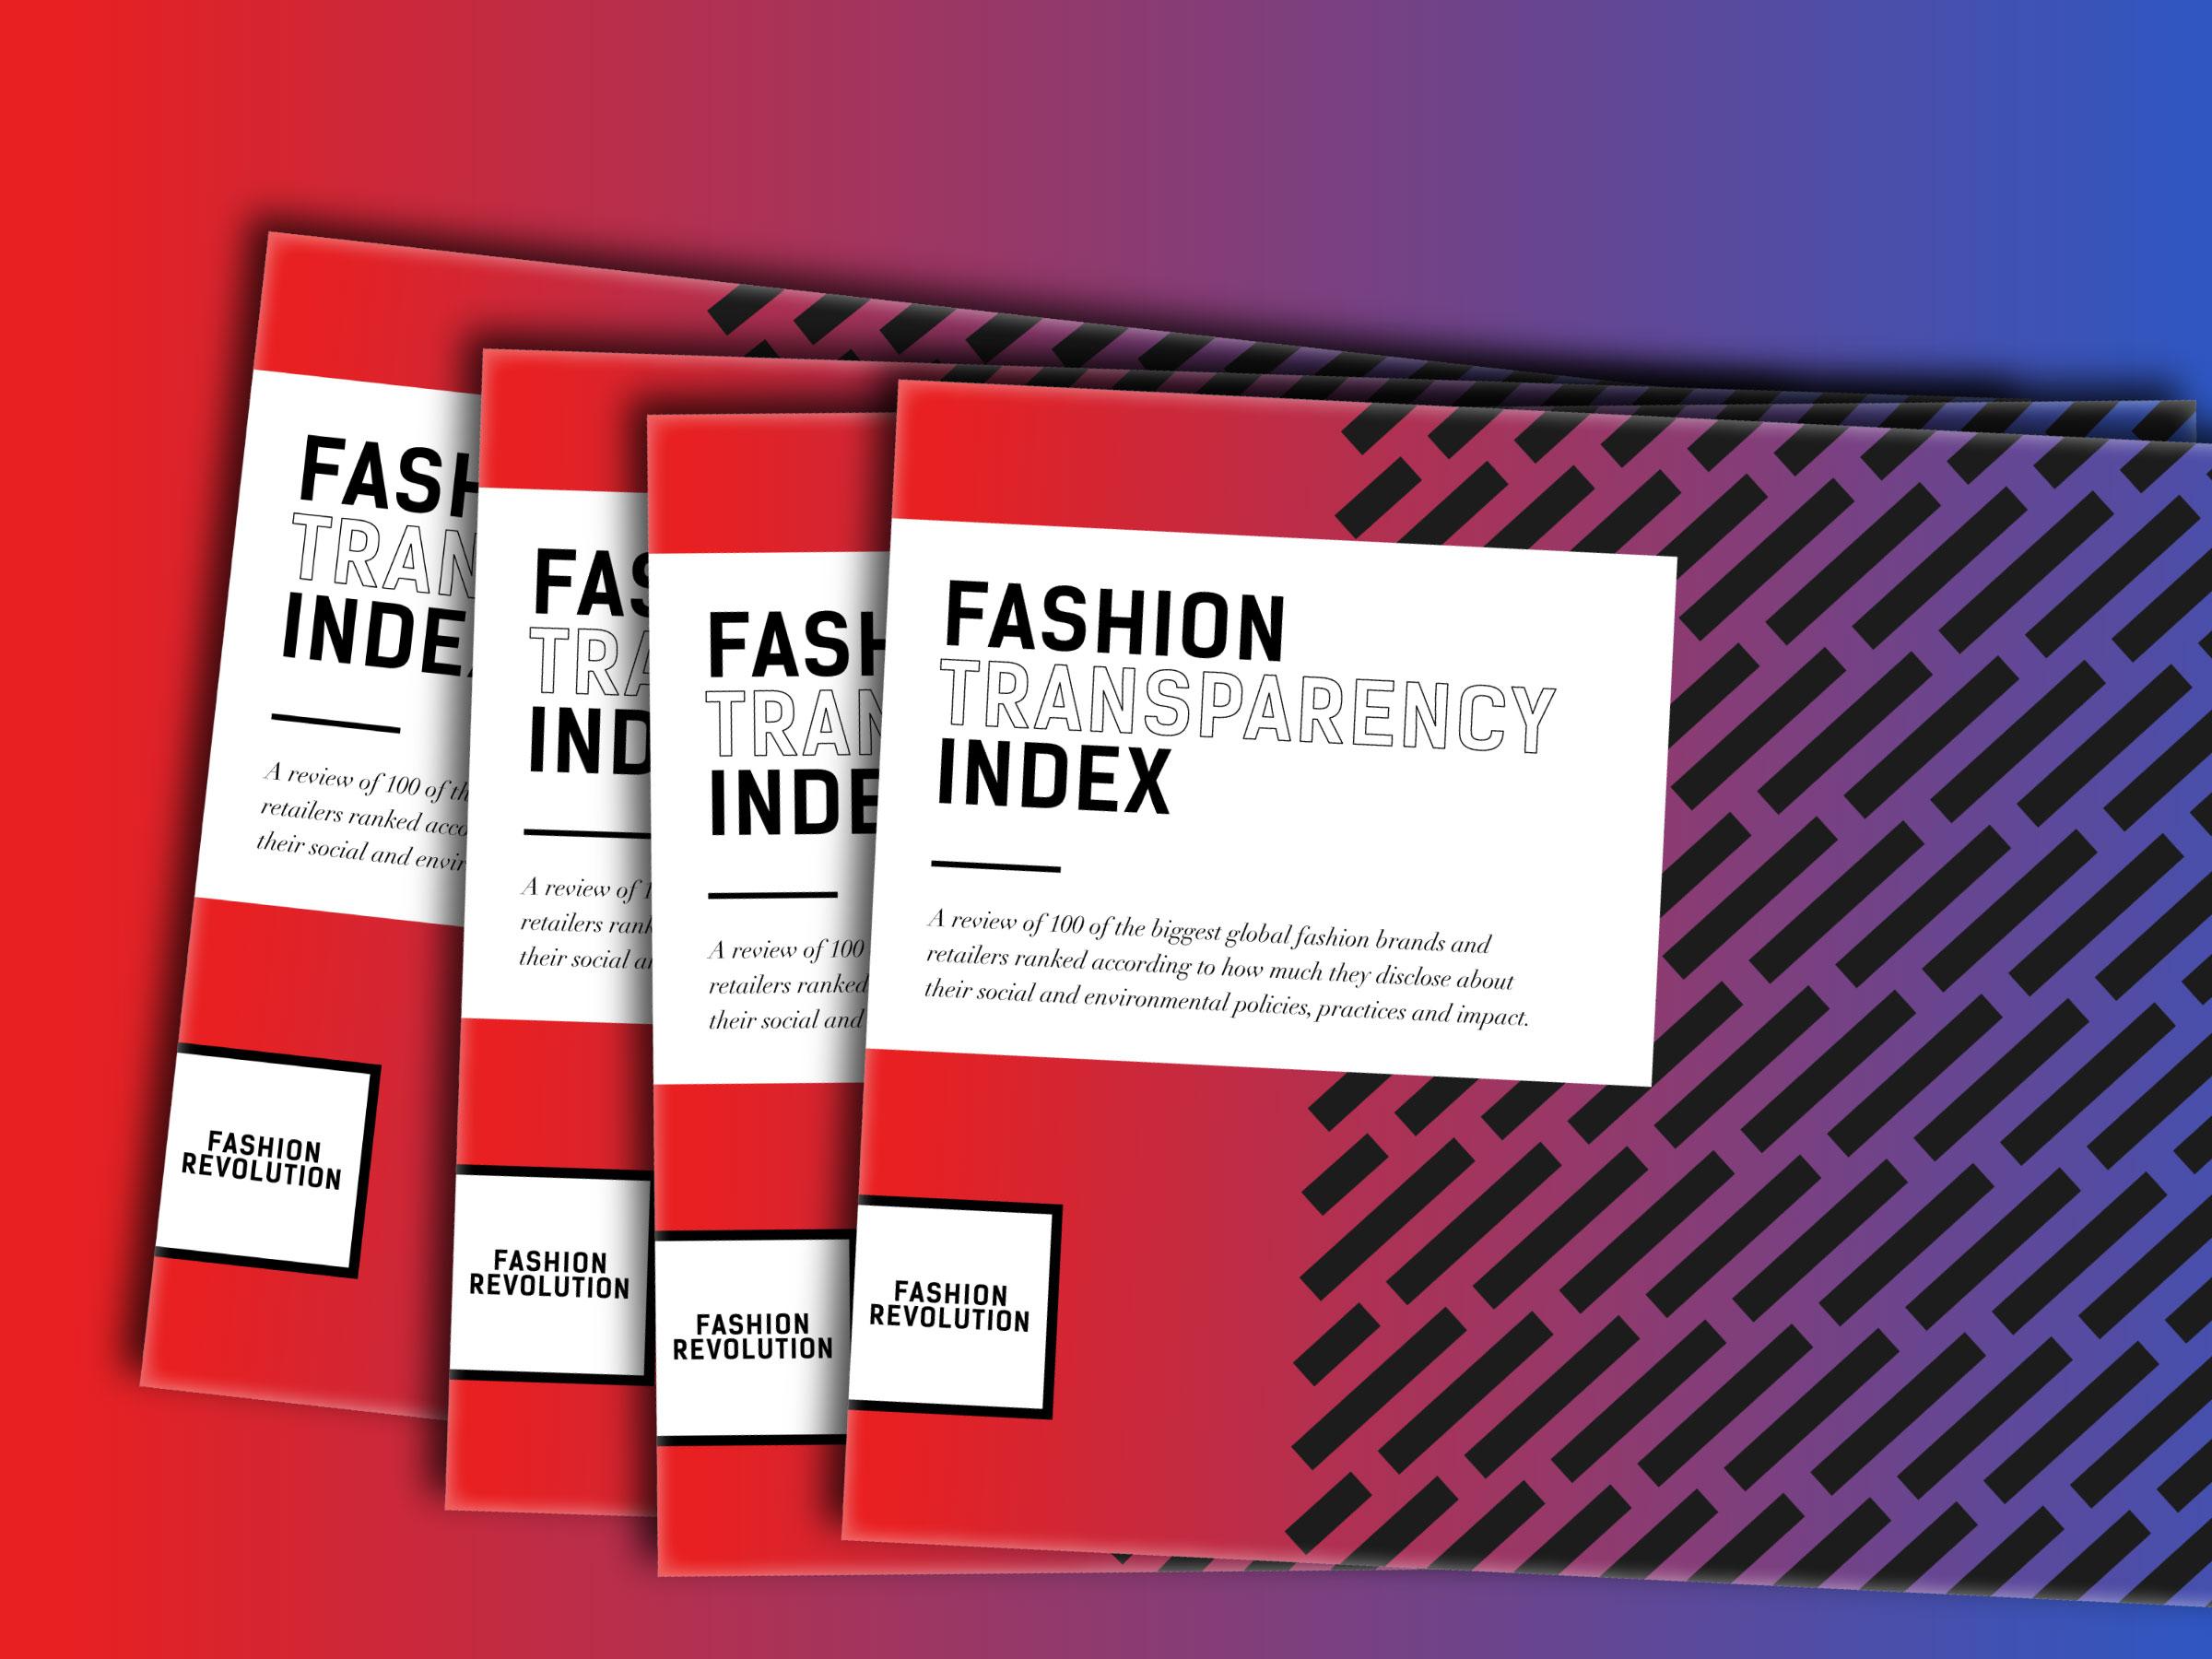 fashiontransparency